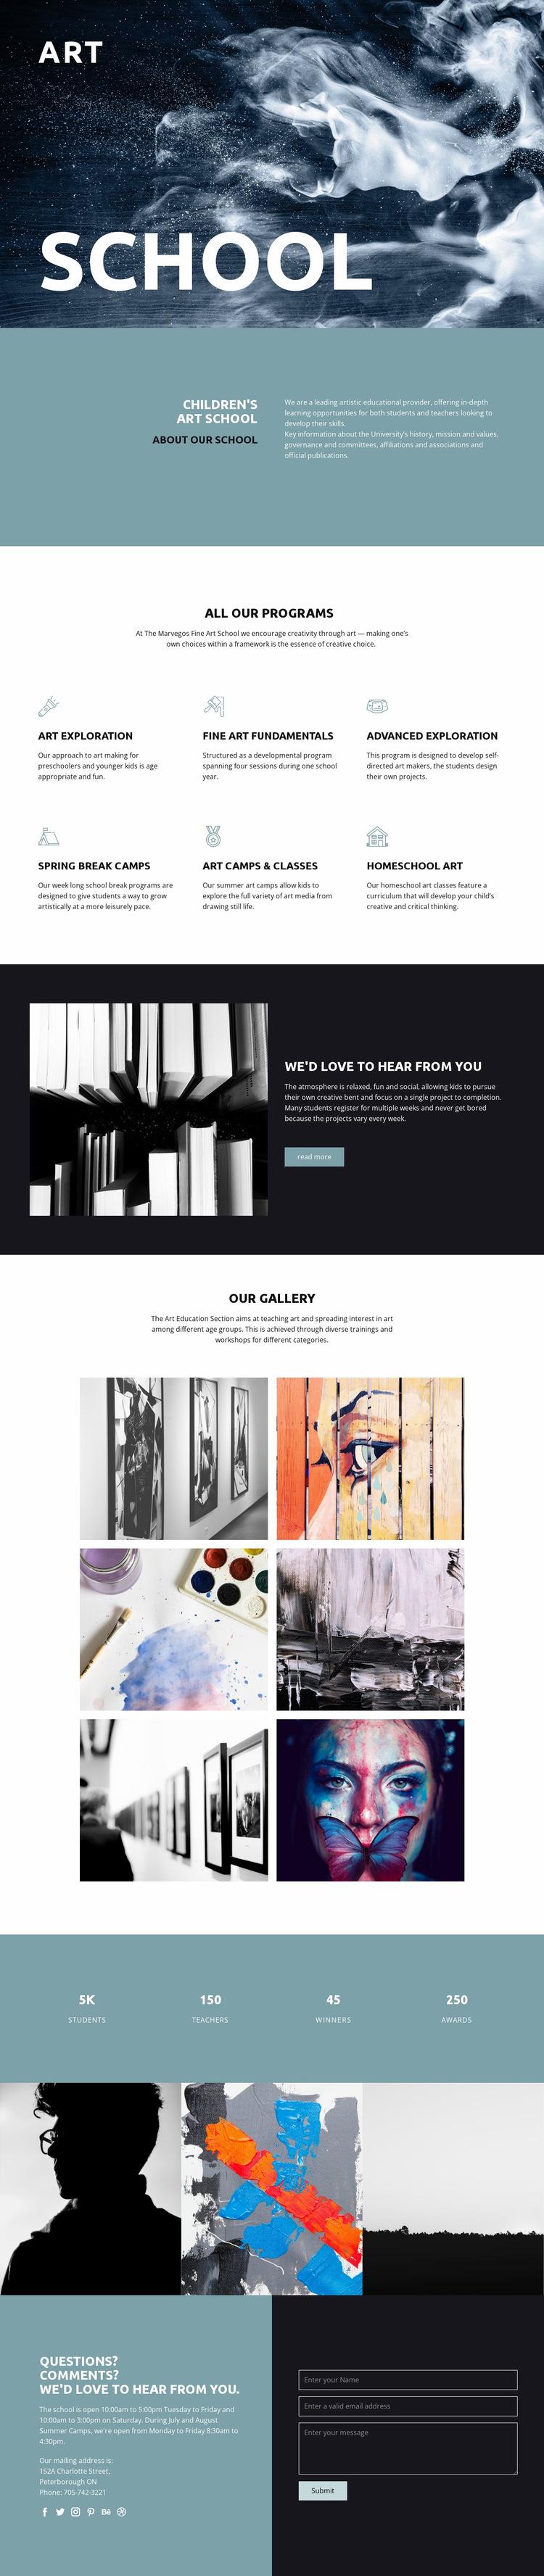 School of artistic education Website Builder Templates